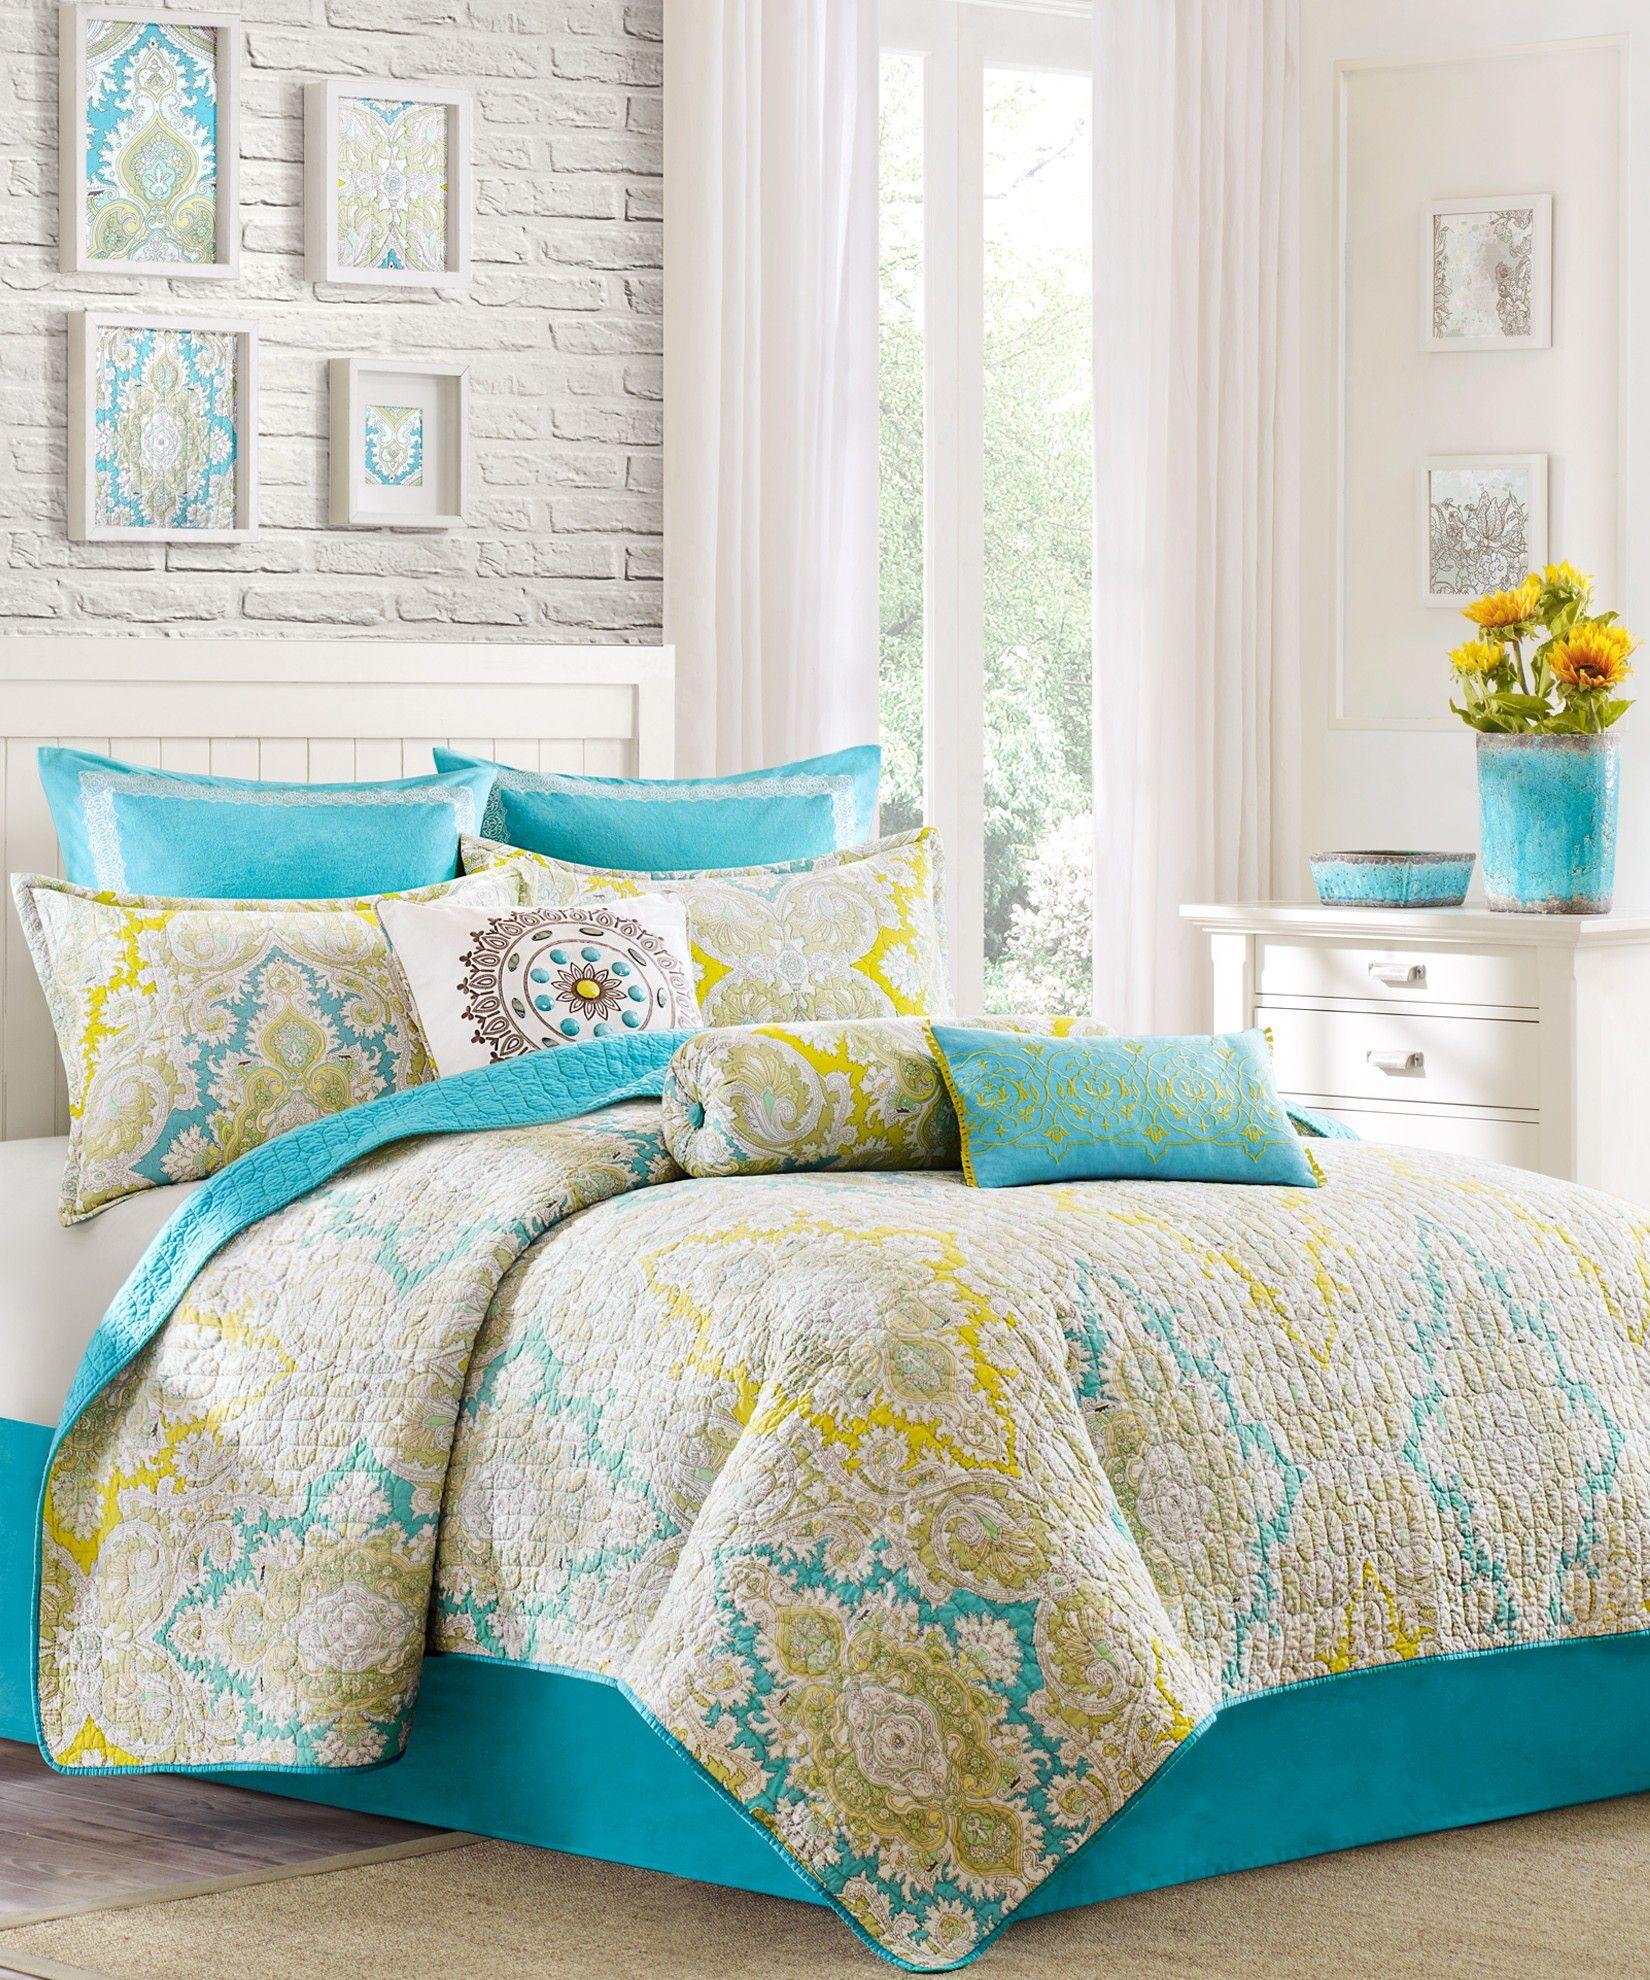 Turquoise_Paisley_Bedding_Echo Paisley bedding, Home